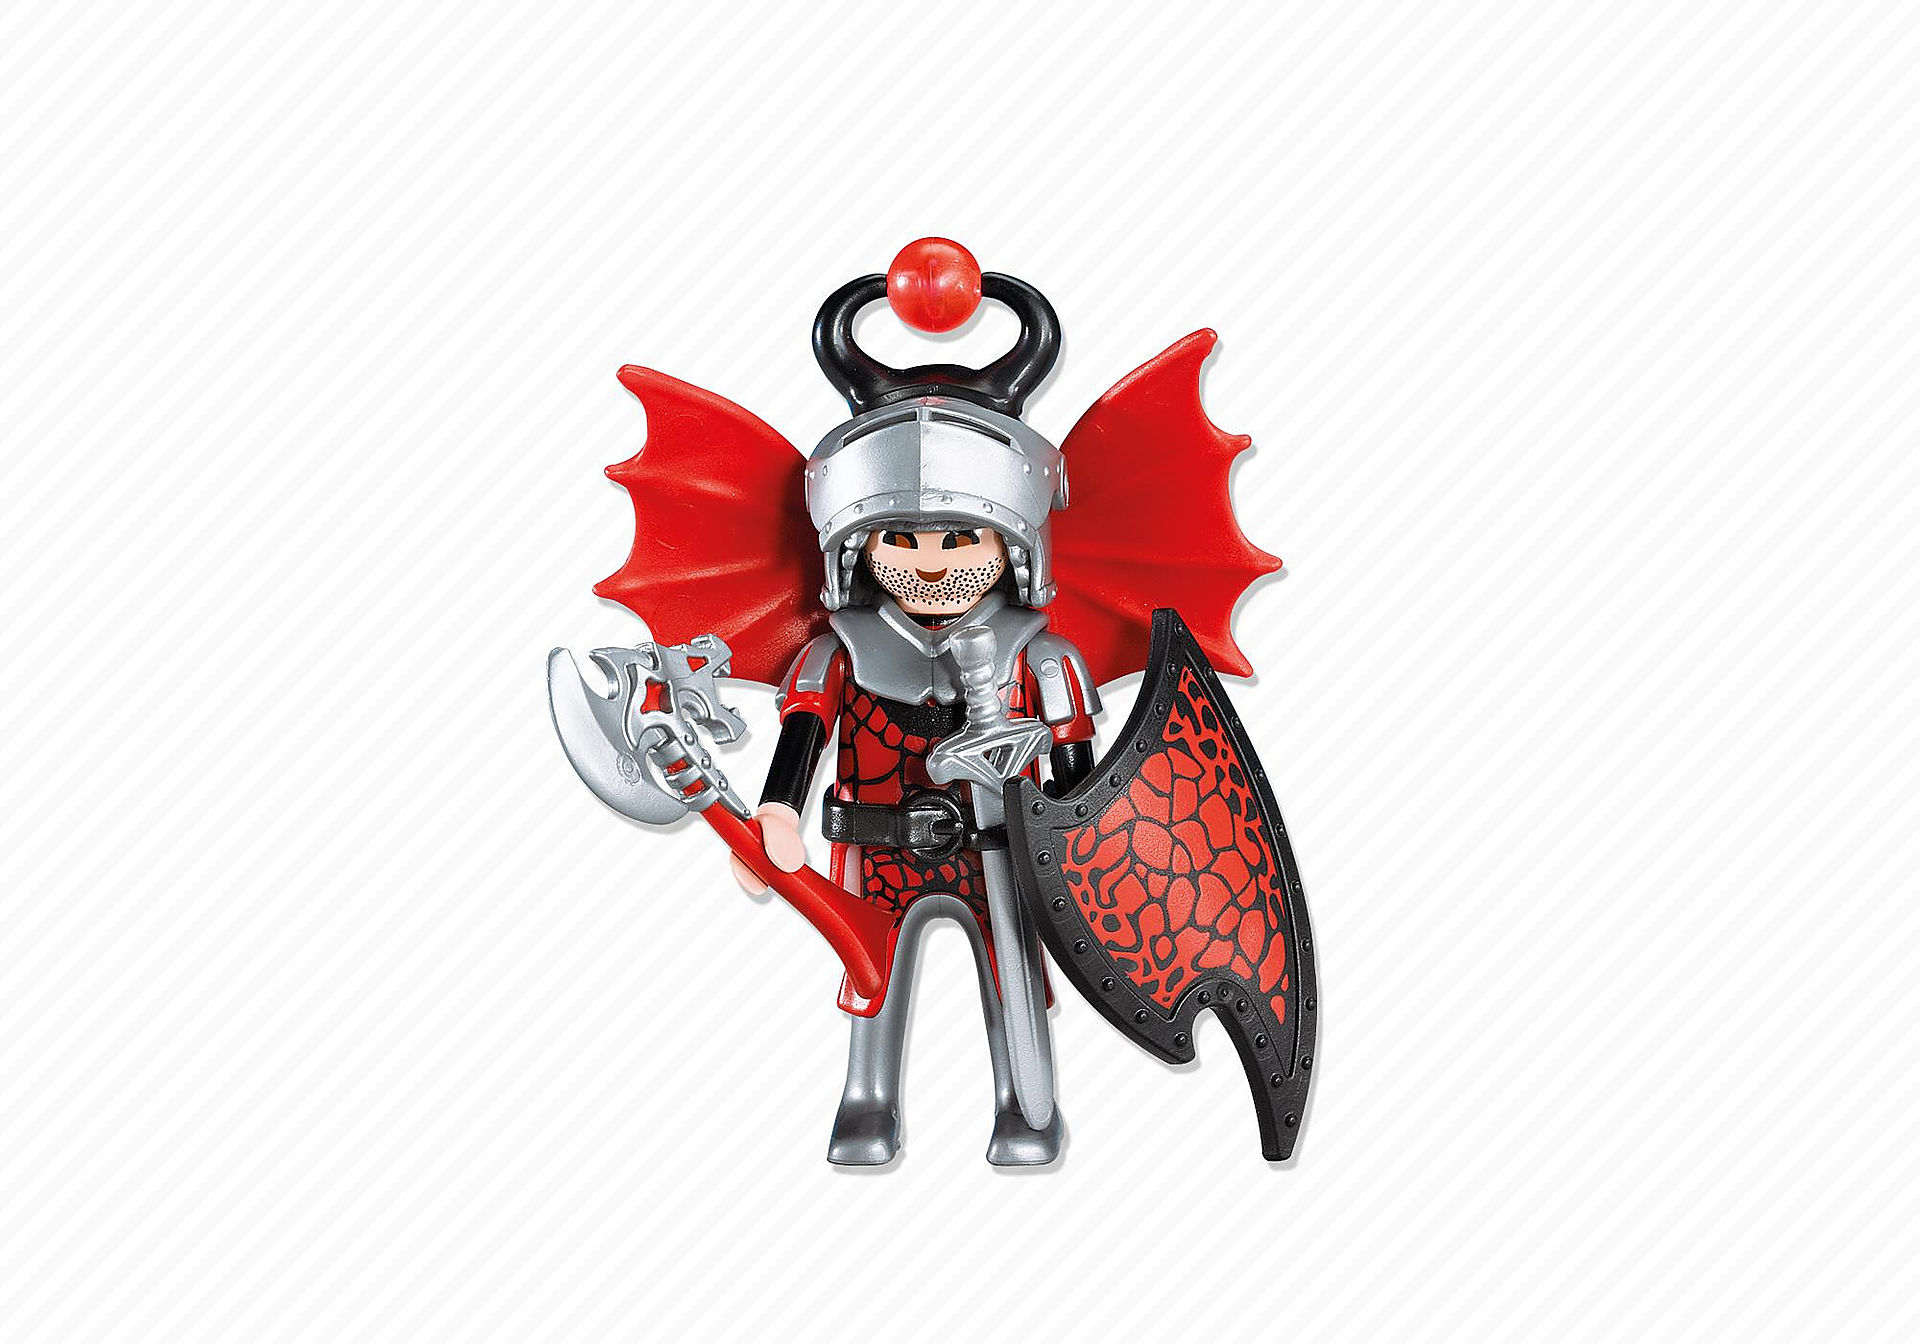 http://media.playmobil.com/i/playmobil/7974_product_detail/Anführer Drachenritter rot